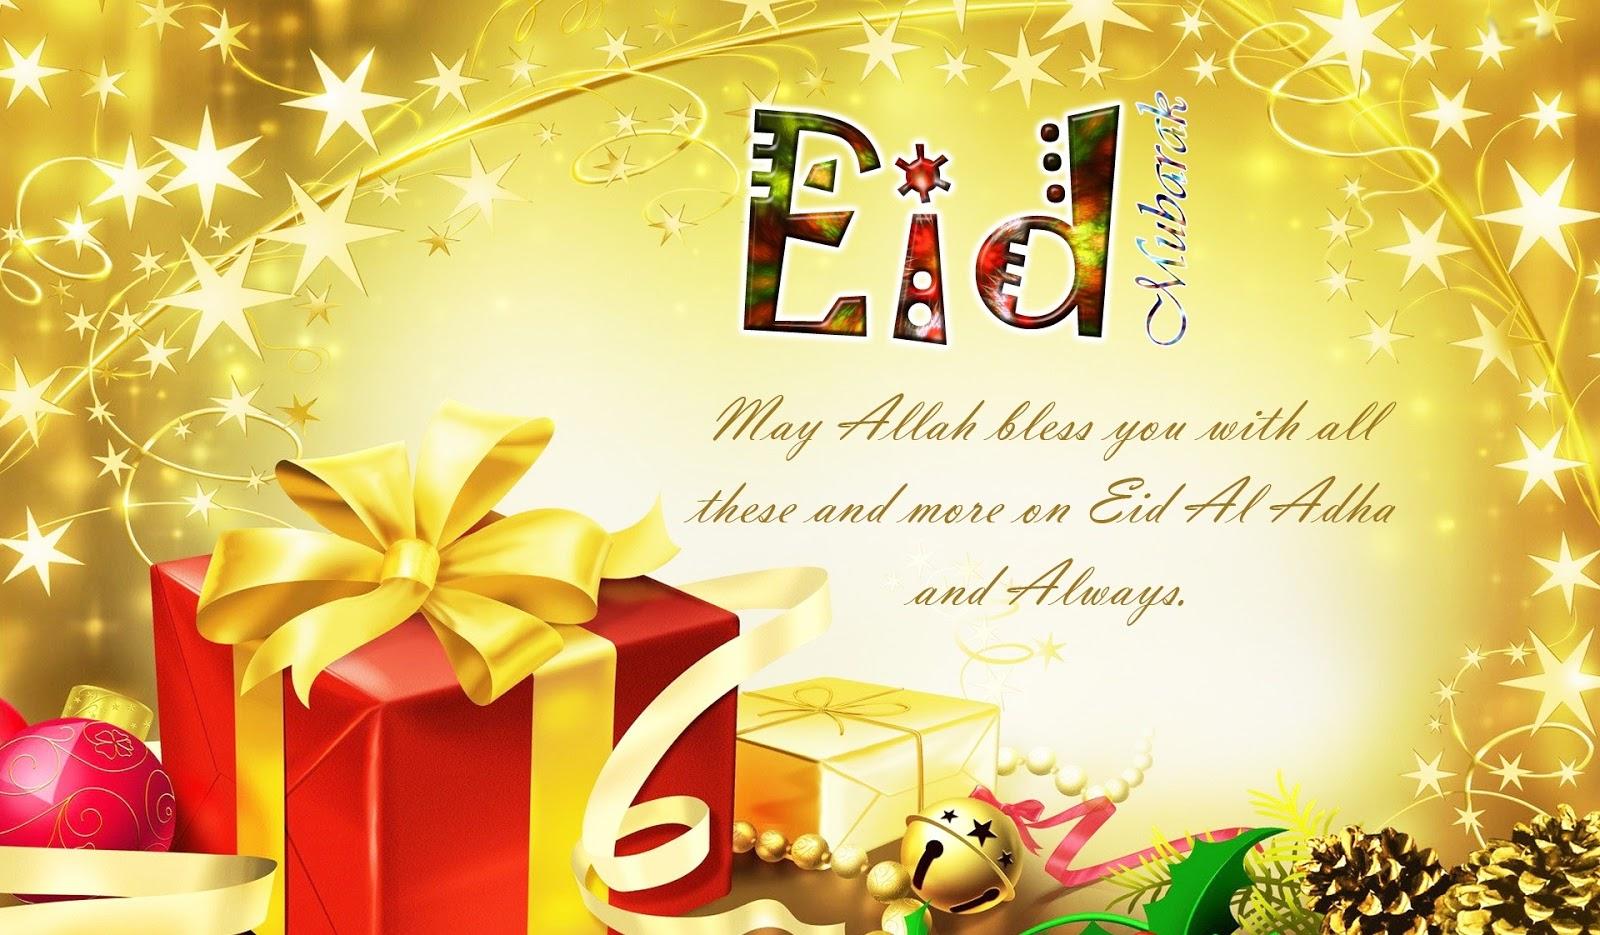 Hd wallpaper eid mubarak - Best Eid Ul Ahda Mubarak Wallpaper For Parents